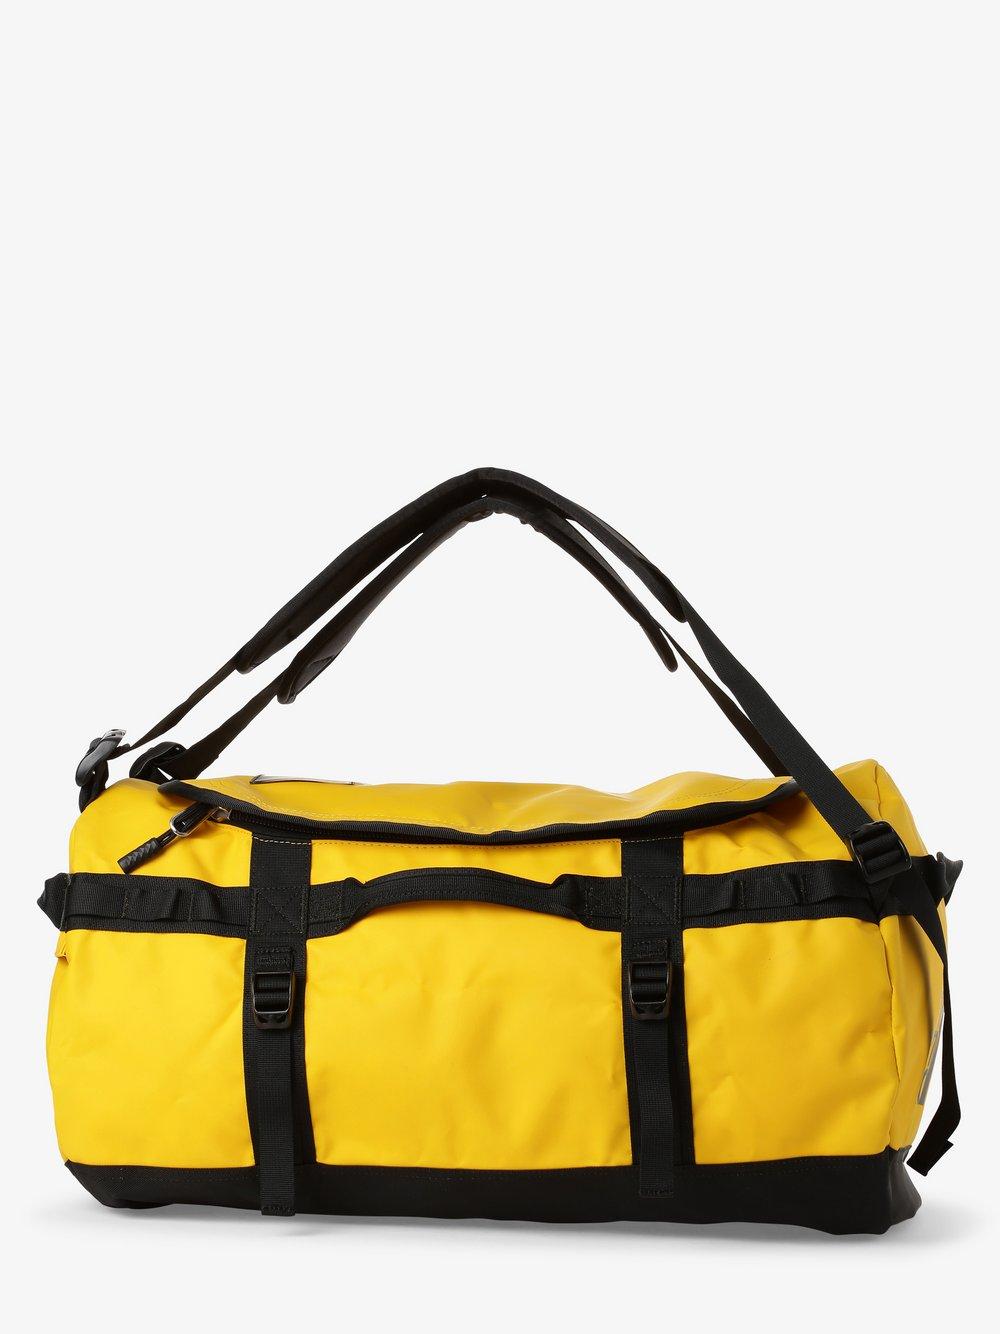 The North Face - Plecak męski, żółty